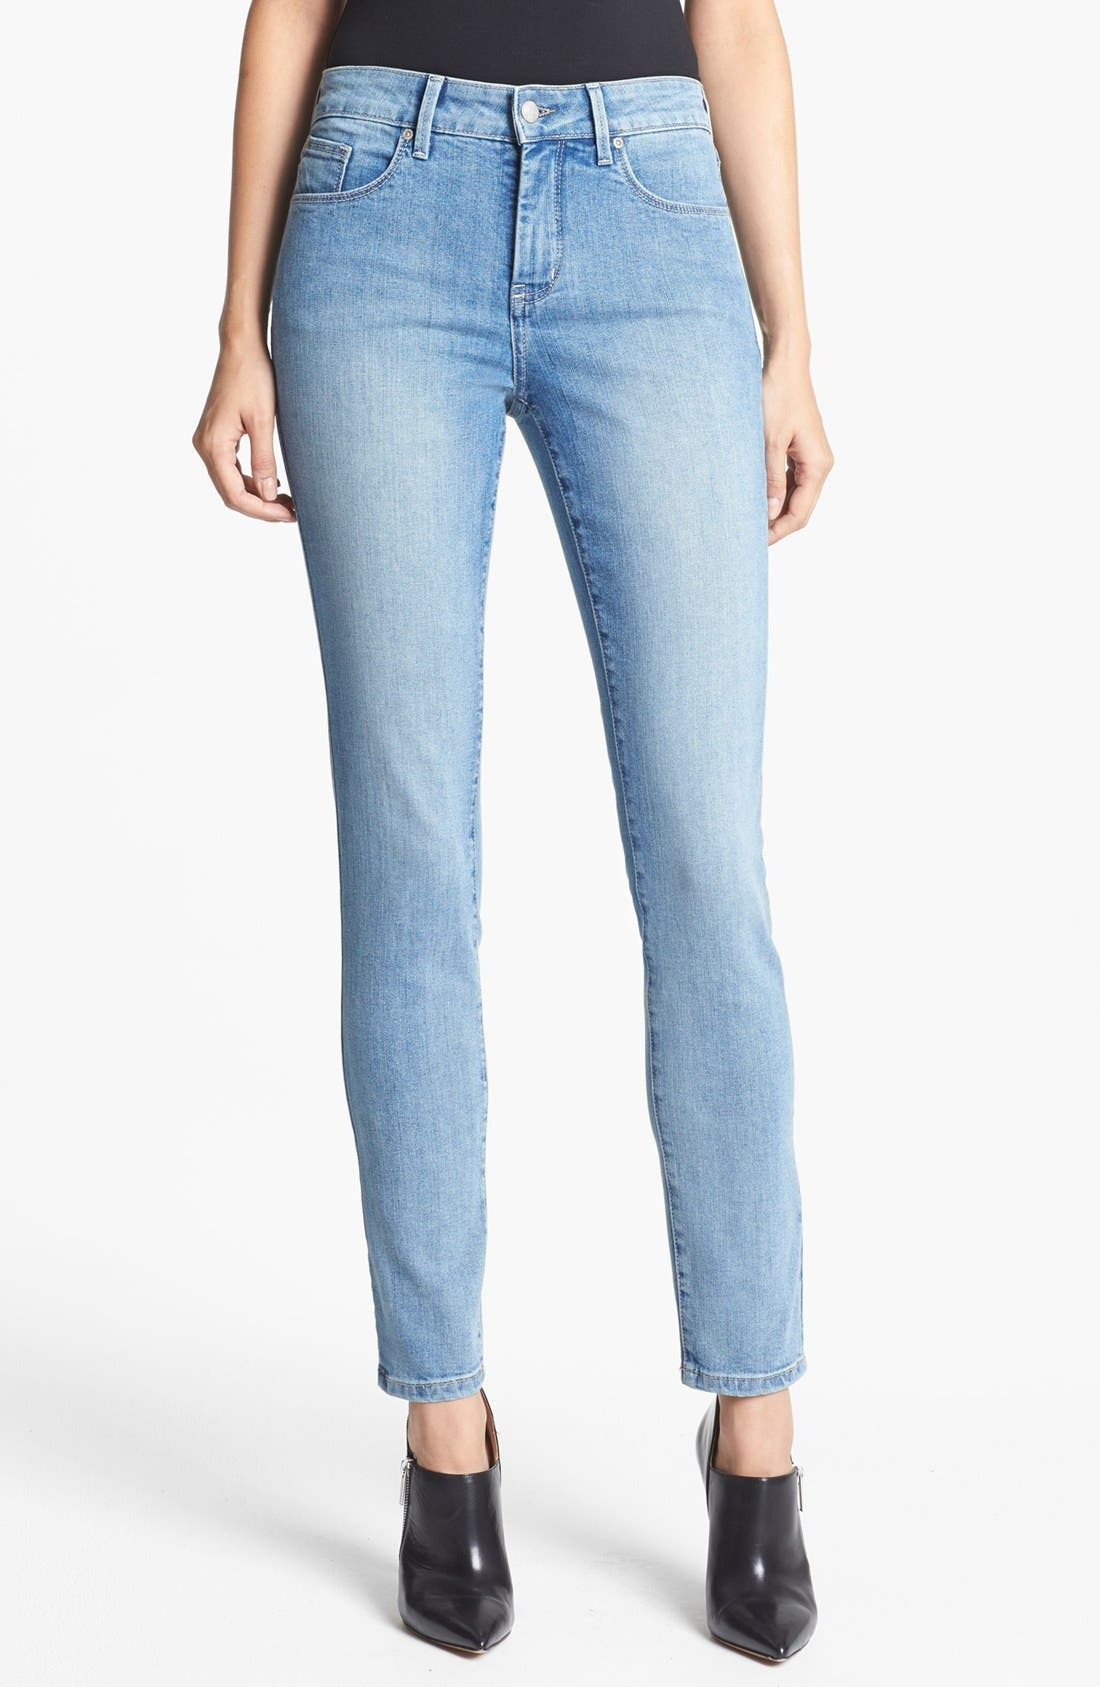 Alternate Image 1 Selected - NYDJ 'Alina' Stretch Skinny Jeans (Sacramento) (Petite)